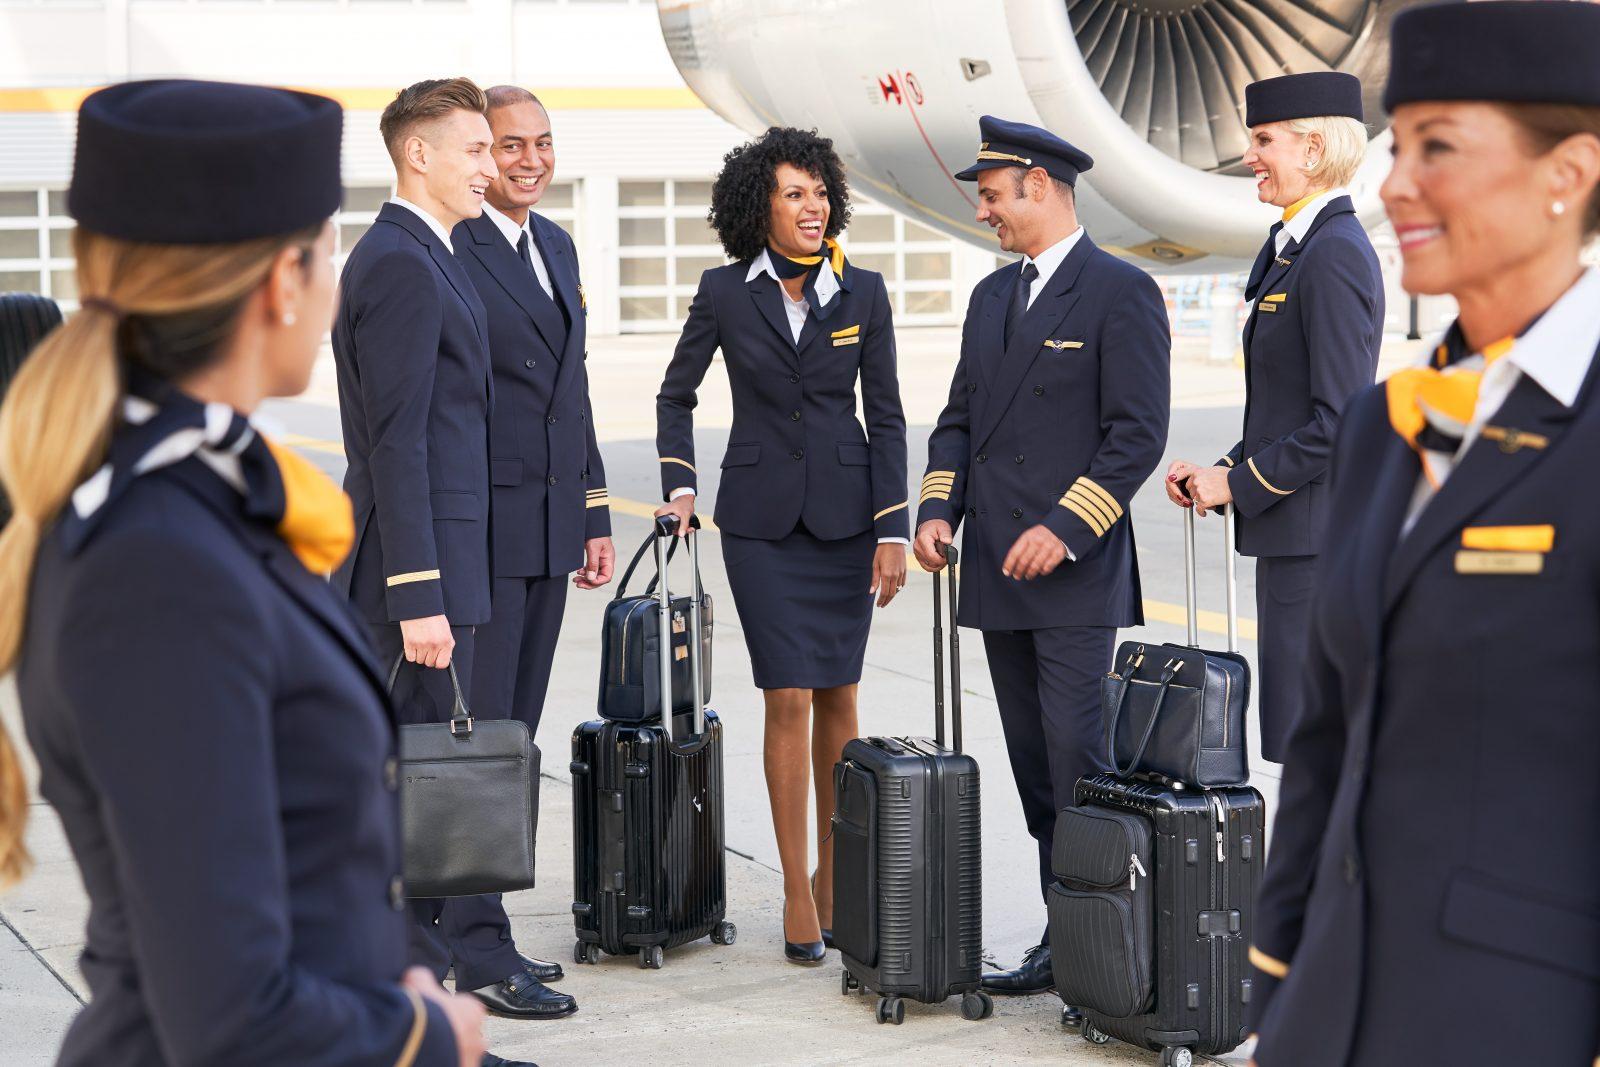 Lufthansa Group to cut 22,000 jobs